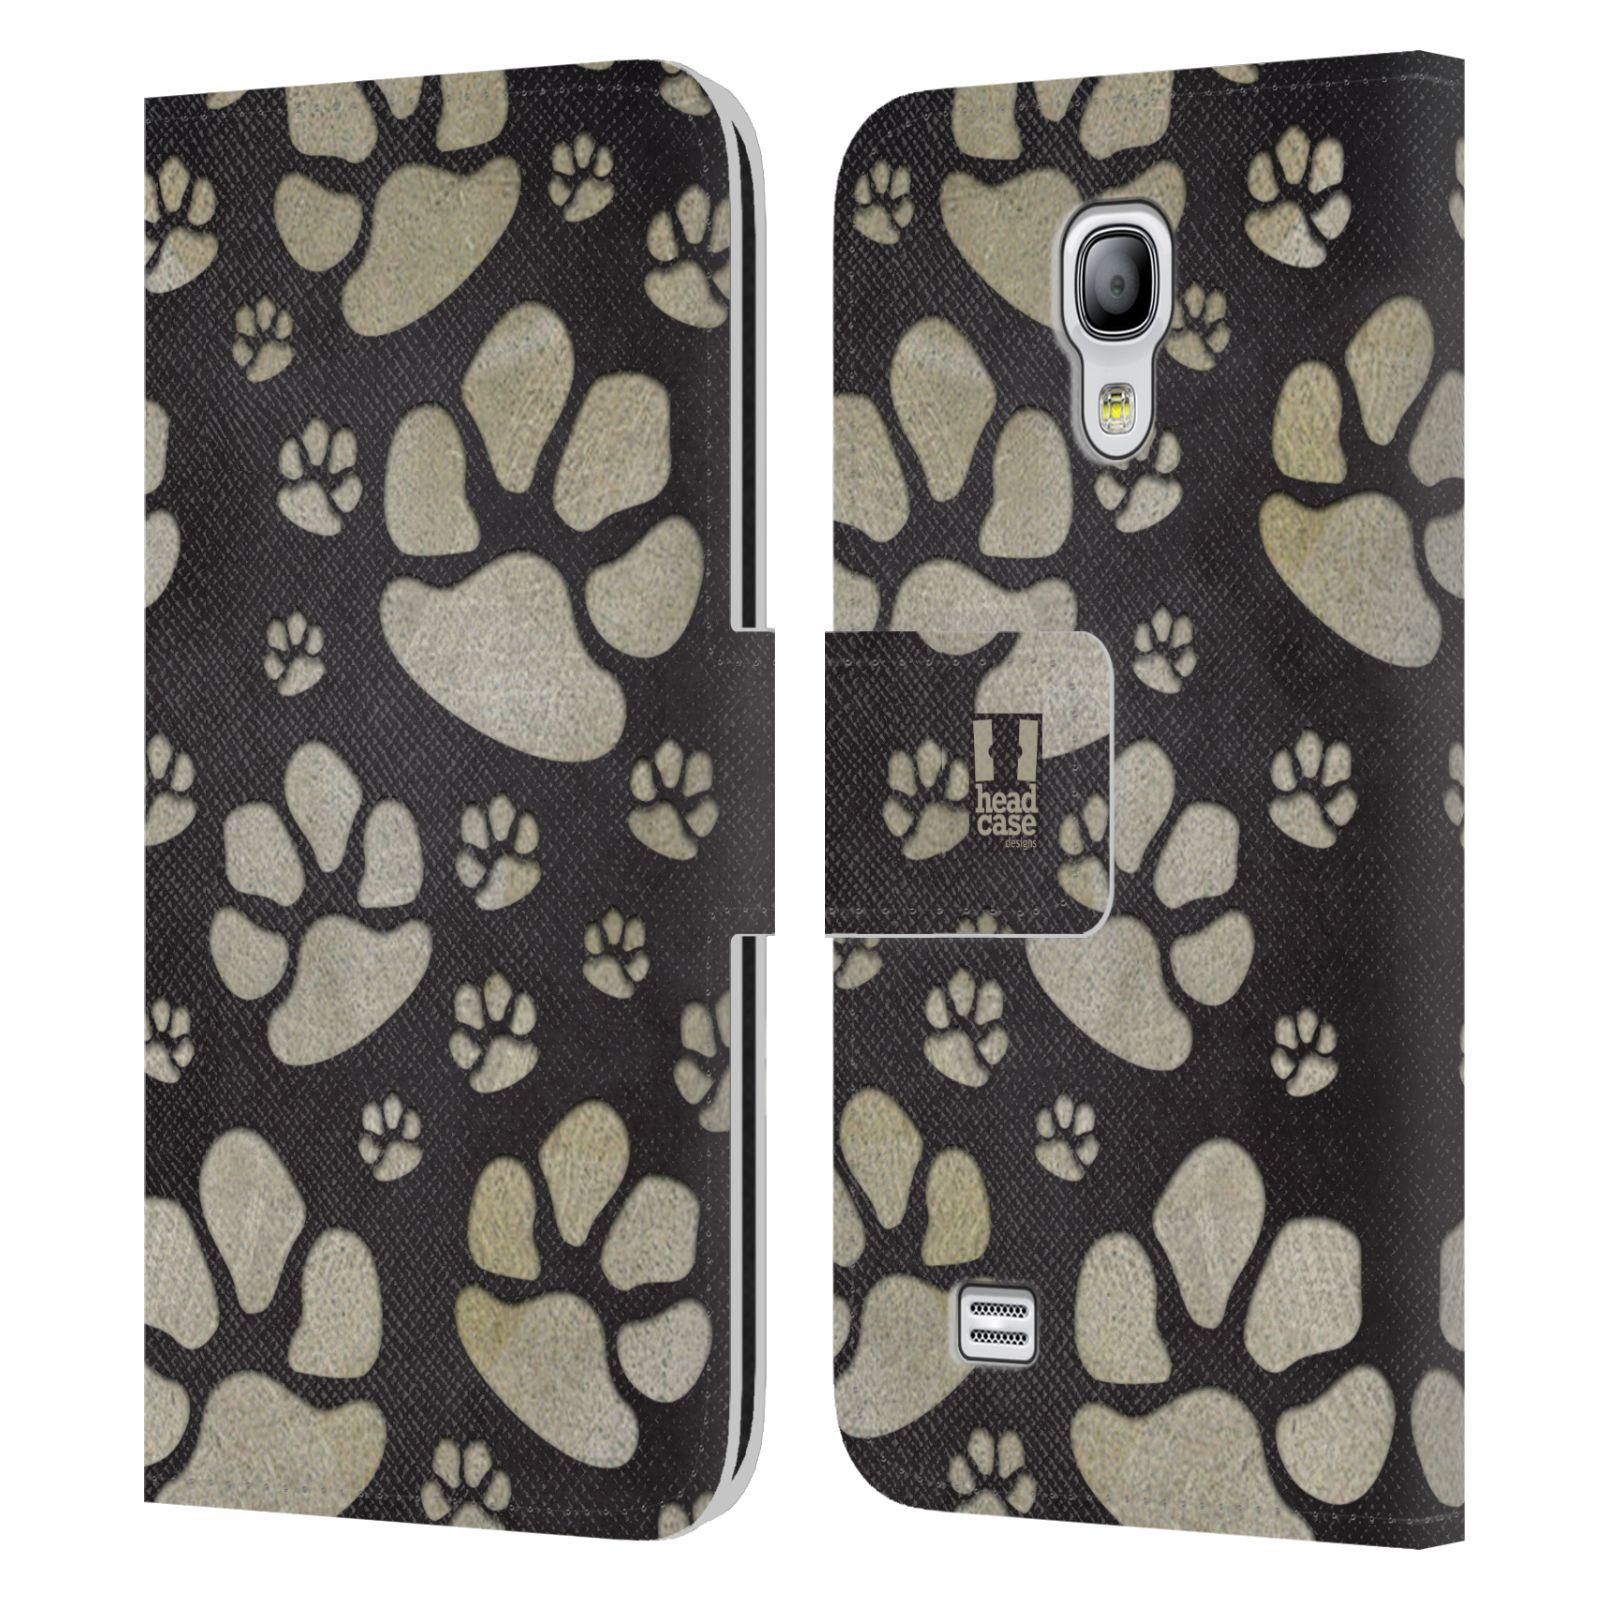 HEAD CASE Flipové pouzdro pro mobil Samsung Galaxy S4 MINI / S4 MINI DUOS Pejsek ťapky velké tmavá